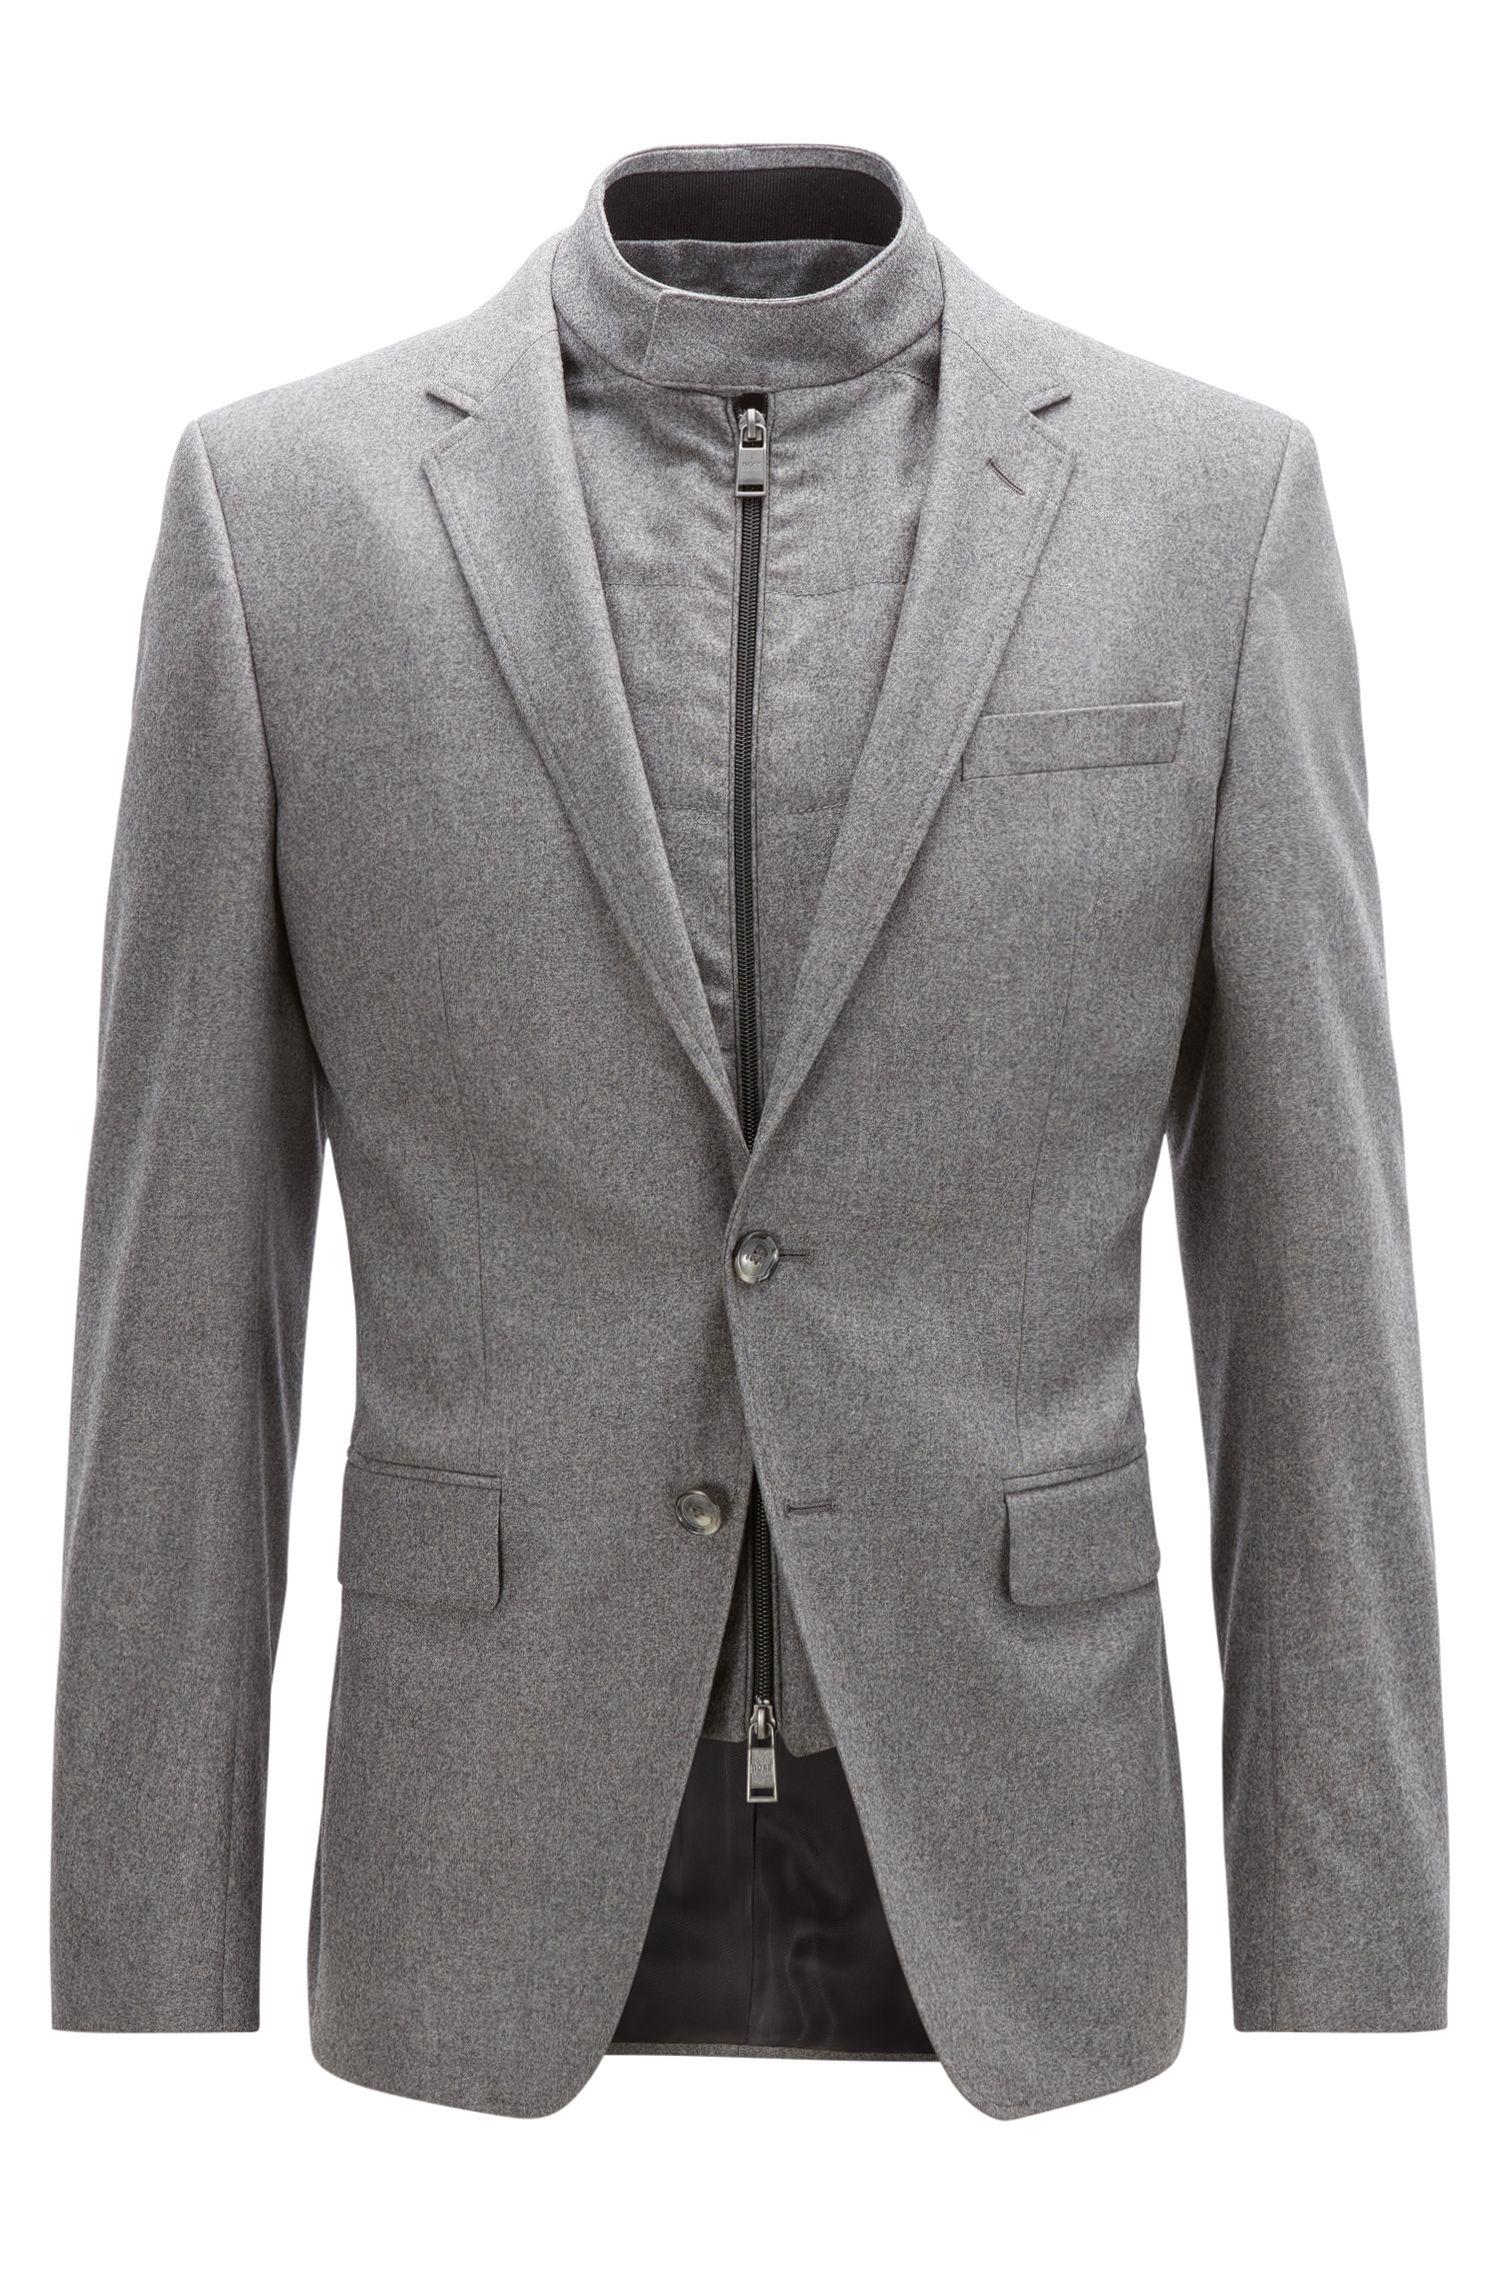 'Hadwart' | Stretch Virgin Wool-Cashmere Sport Coat